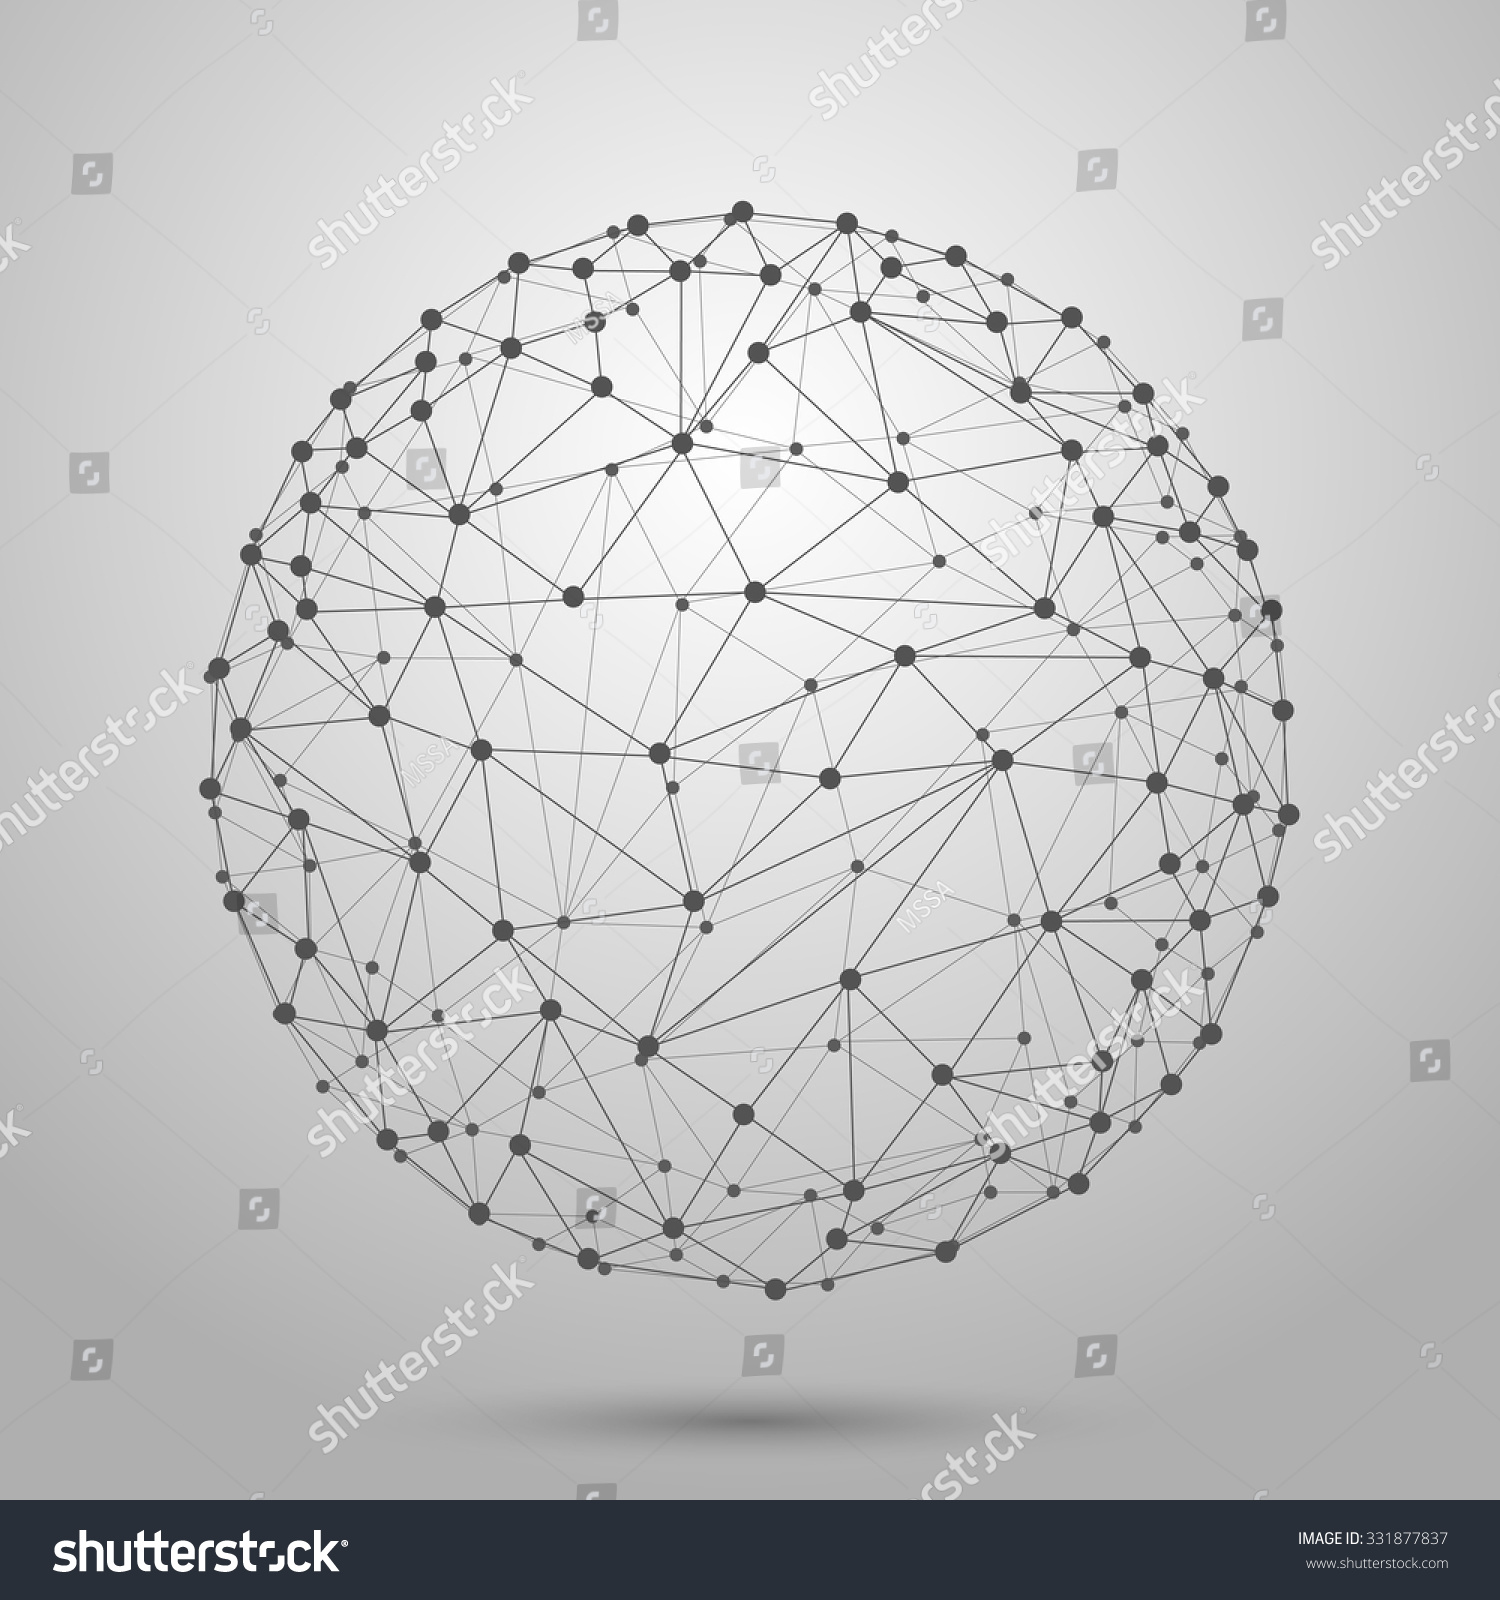 3d Line Design : Wireframe d mesh polygonal vector sphere network line